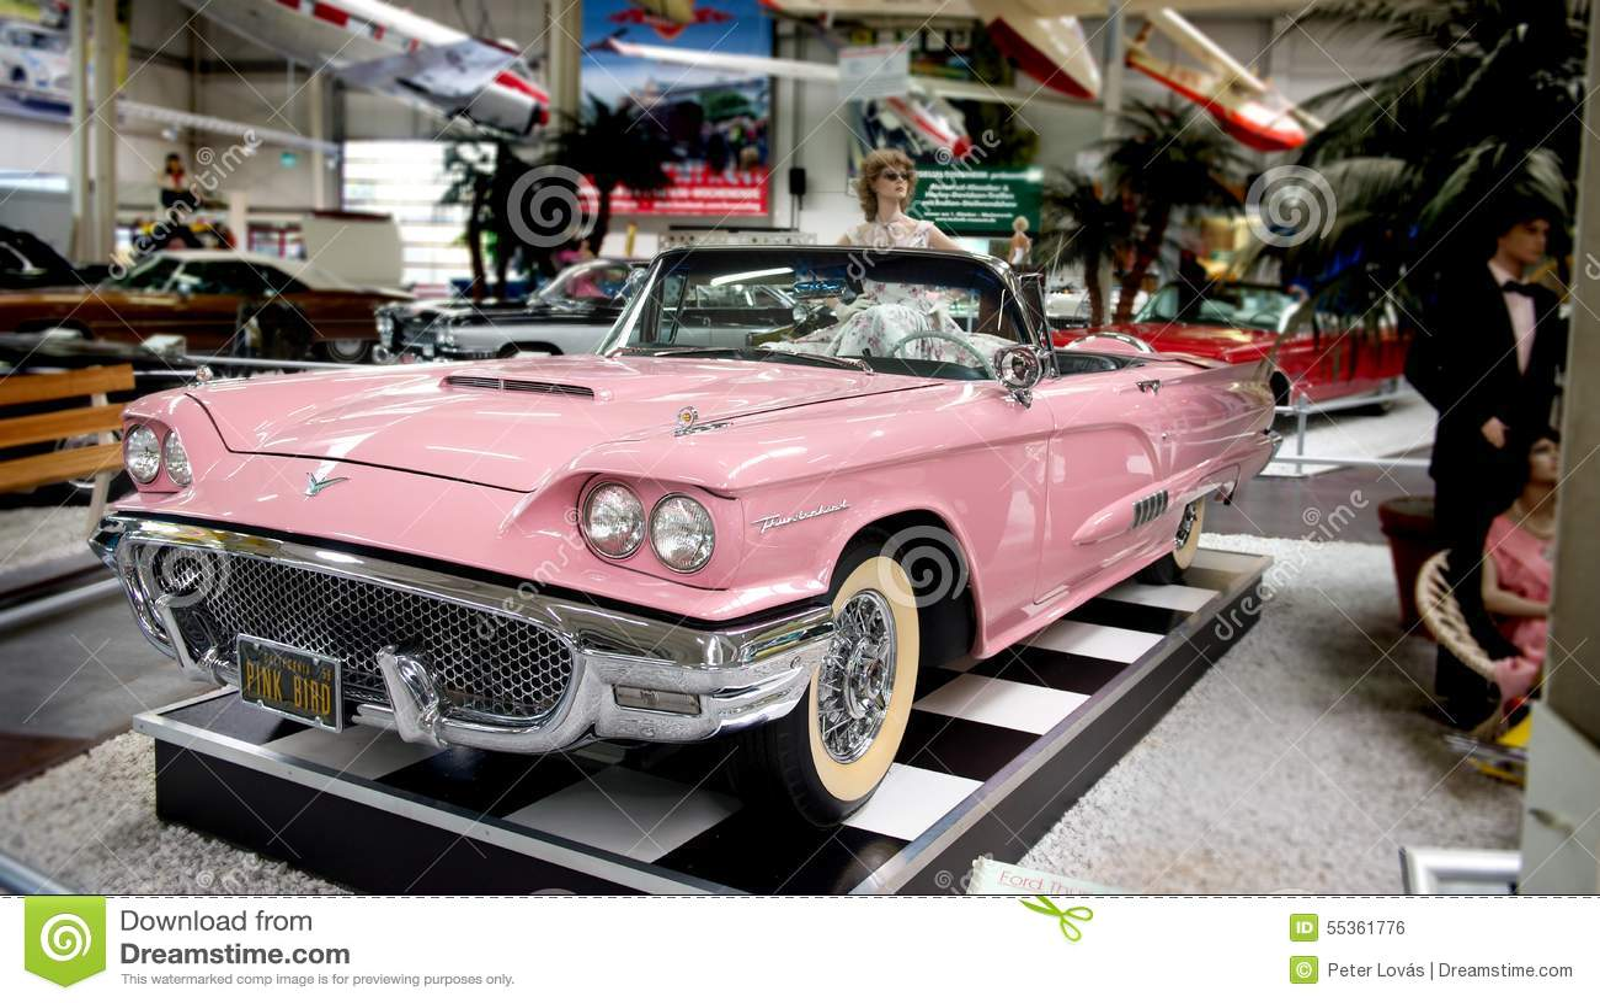 Classic Dream Cars - Home   Facebook